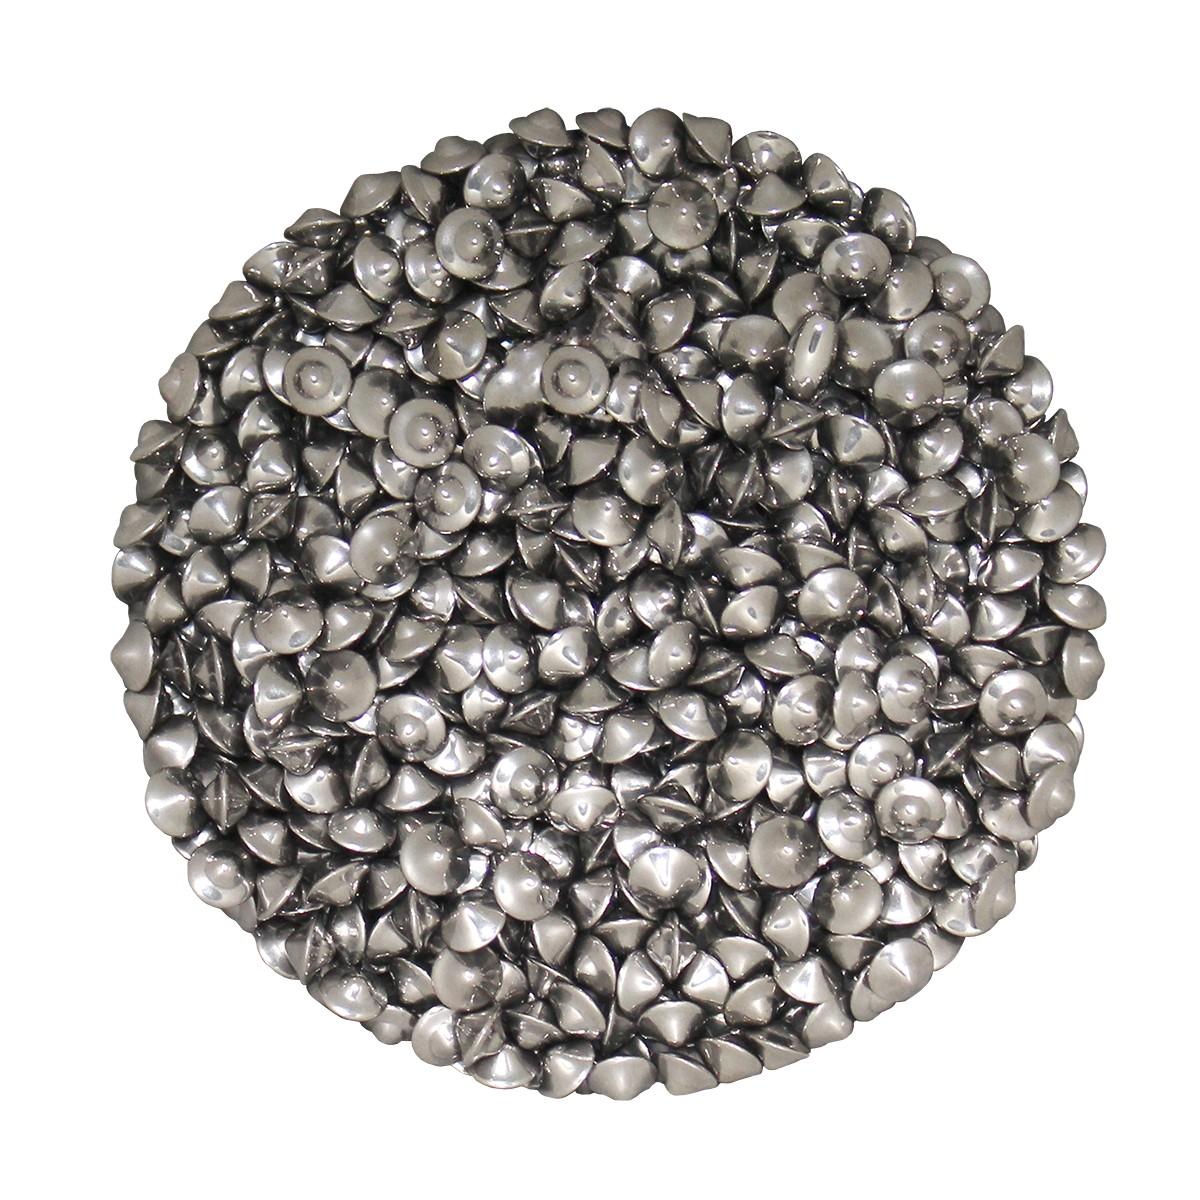 Carbon Steel Shot Media - Balcone